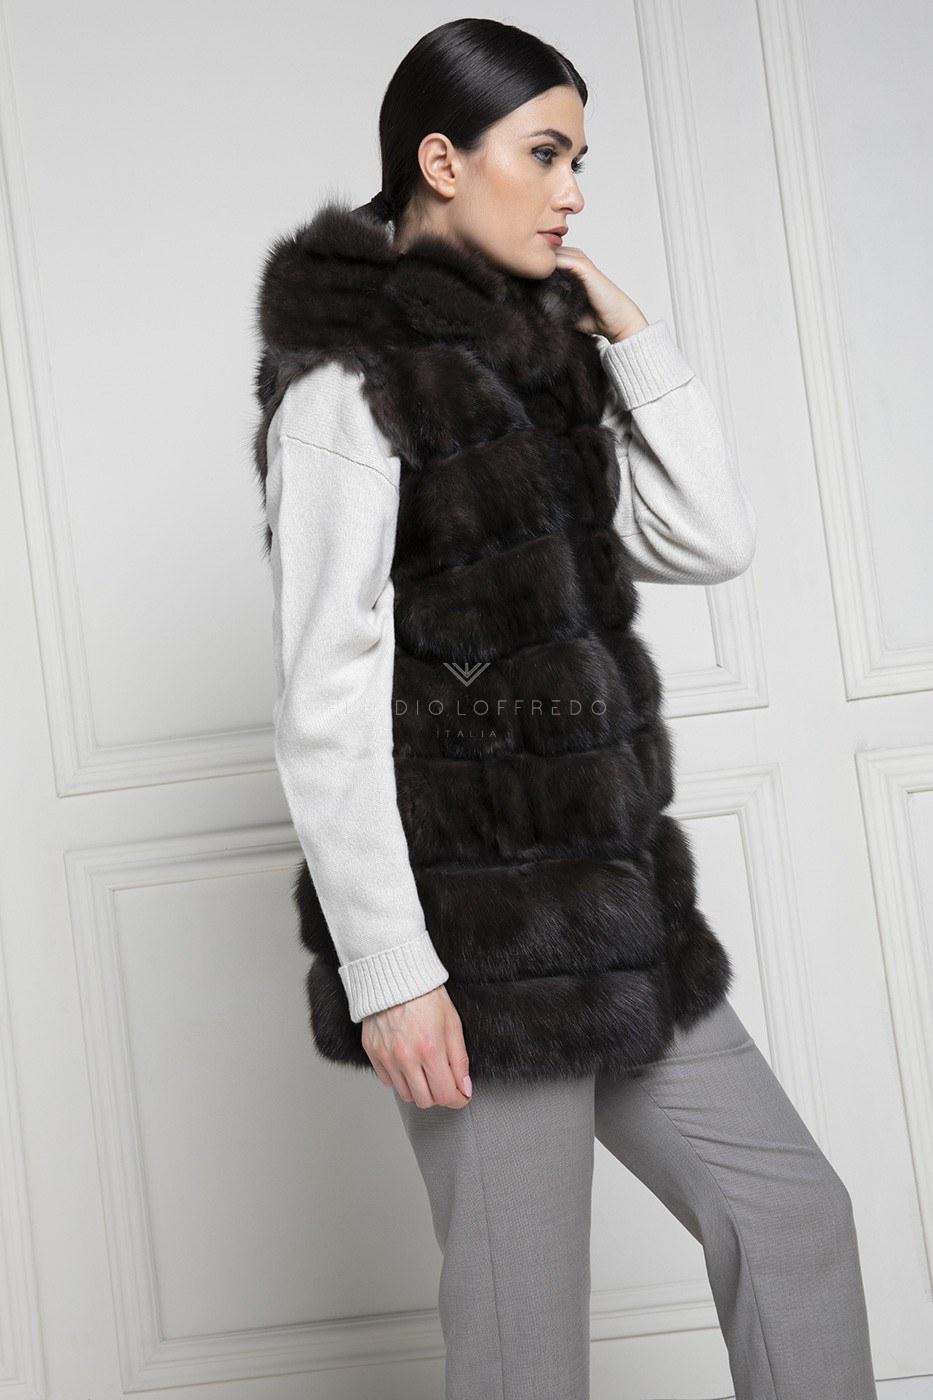 Satin Parka with Barguzinsky Russian Sable Vest - Dark Color